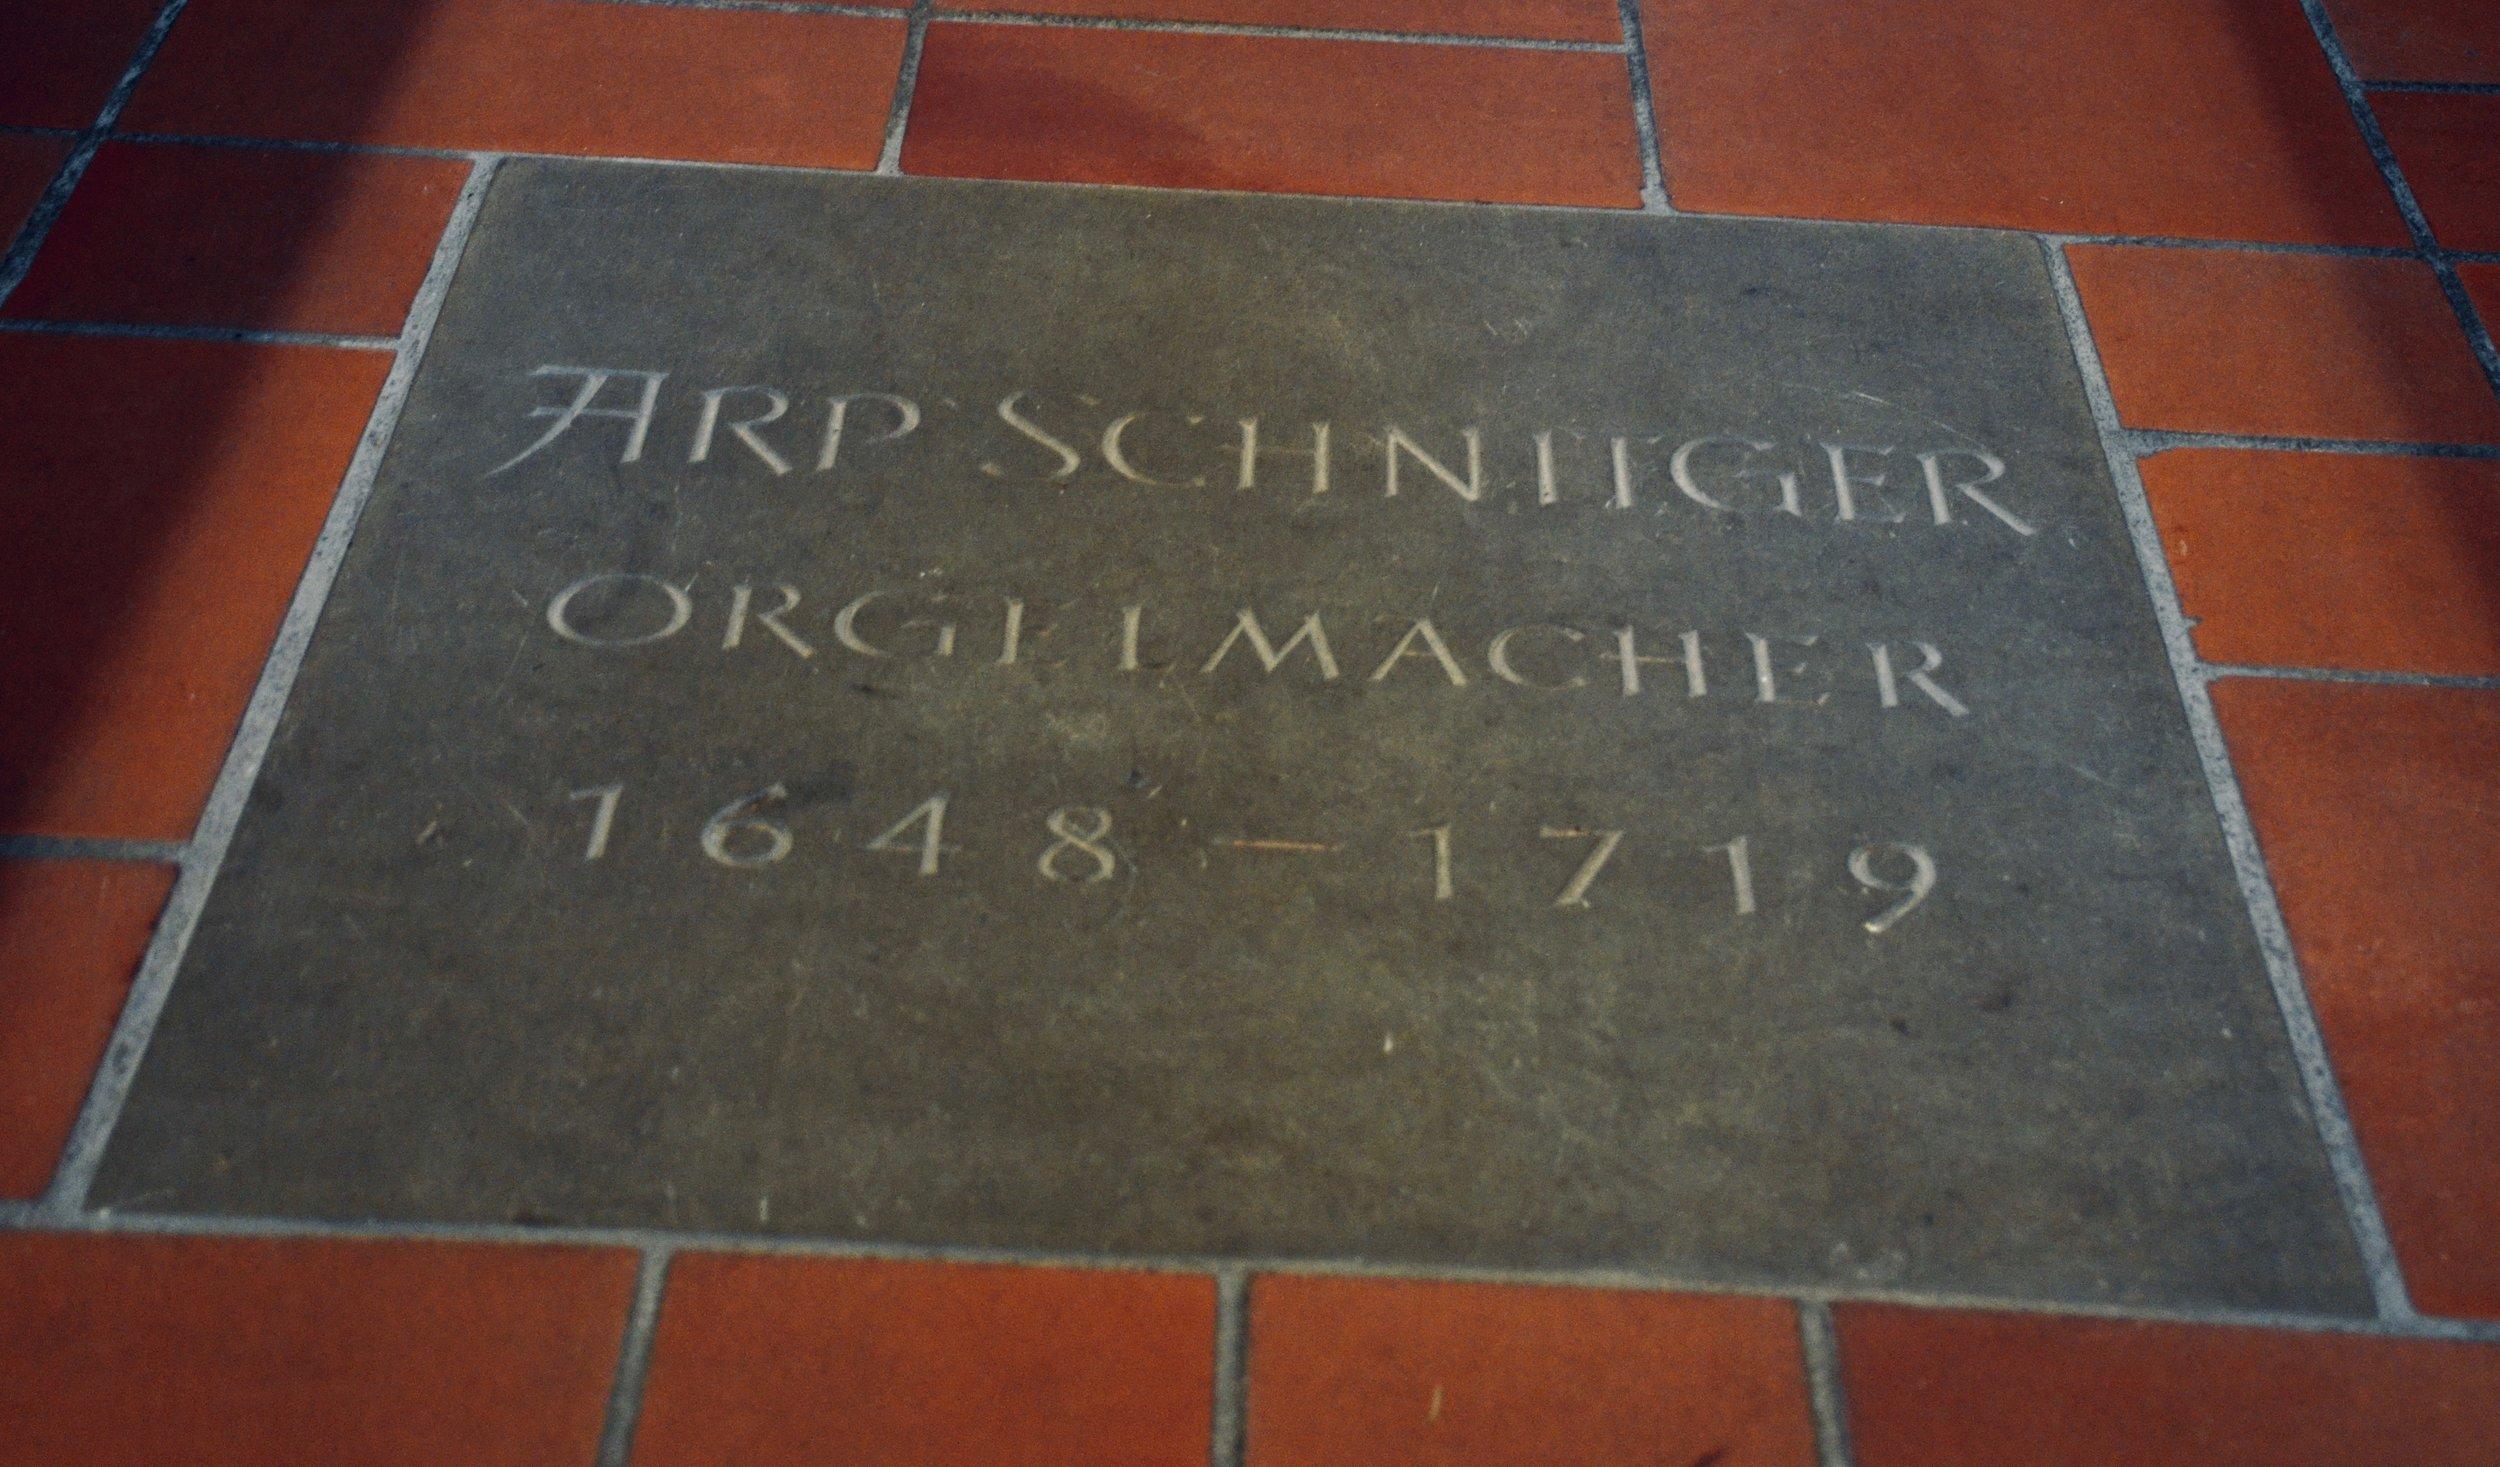 The grave of Arp Schnitger, St. Pankratius, Neuenfelde, Germany. Boston Organ Studio.